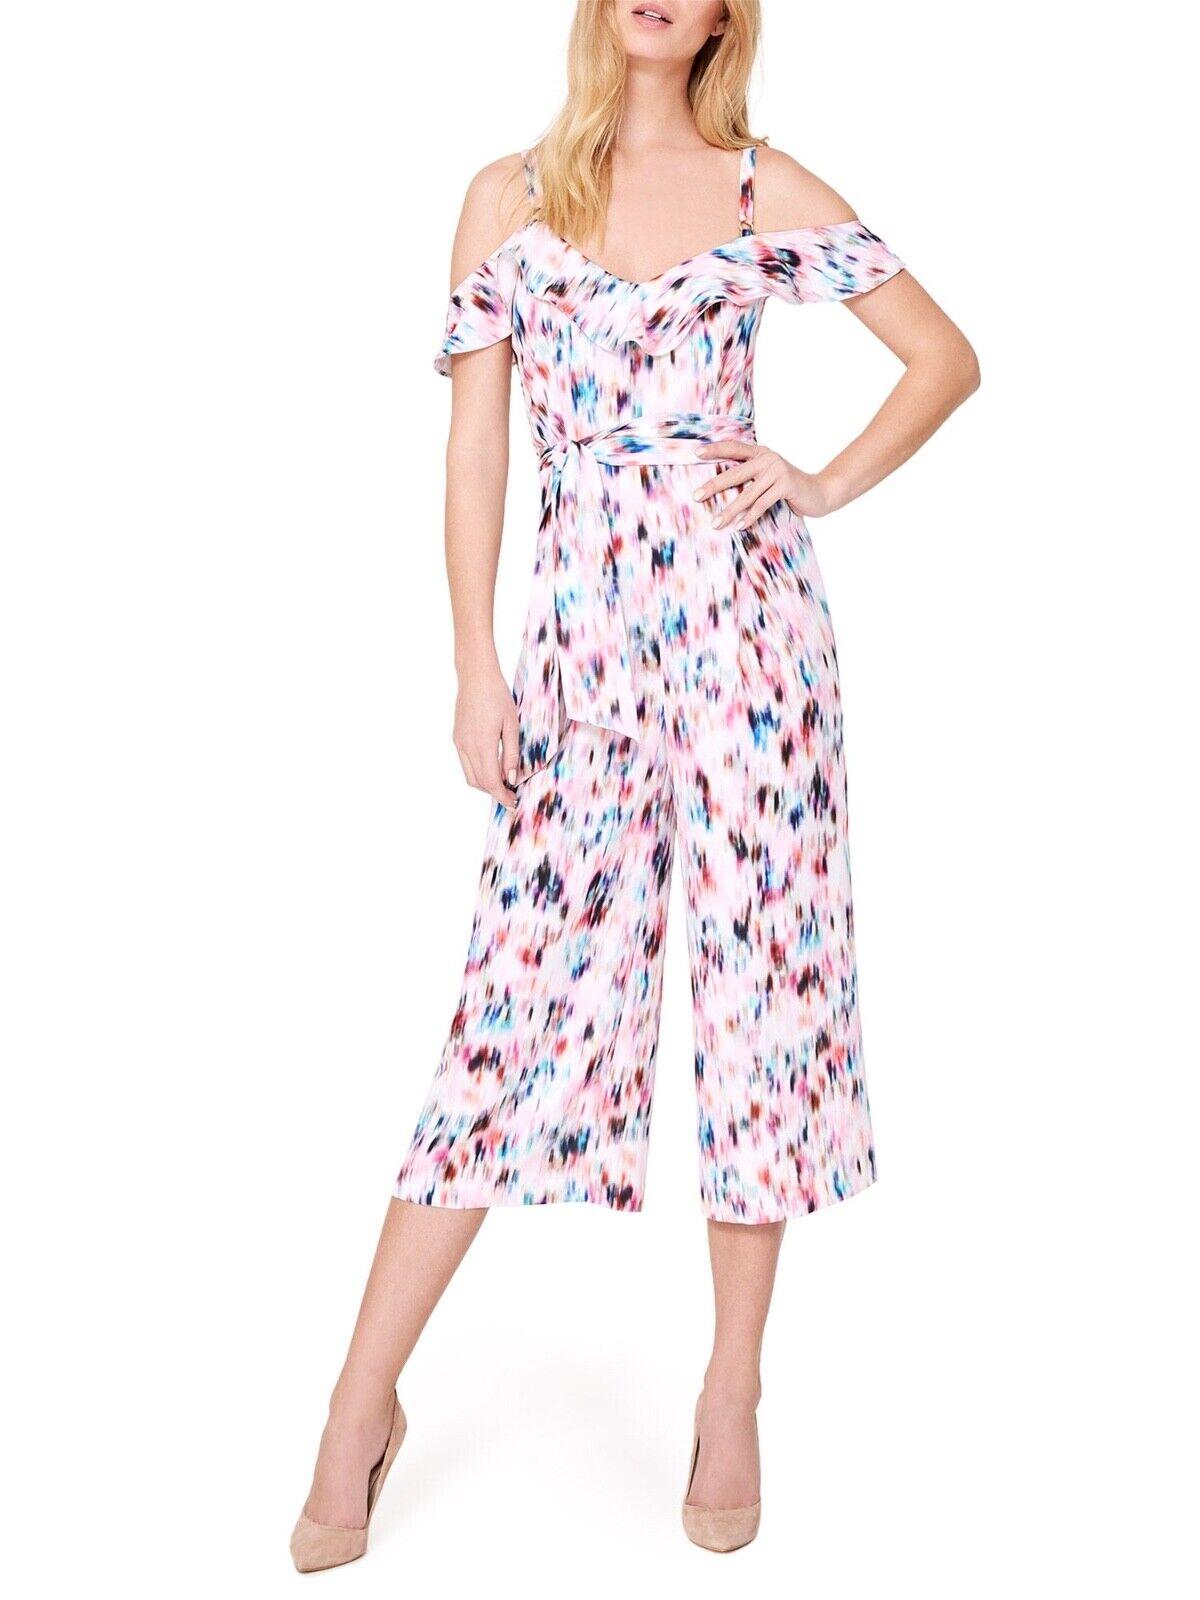 BNWT DAMSEL dans une robe Indi Combinaison Multi Couleur Taille 14